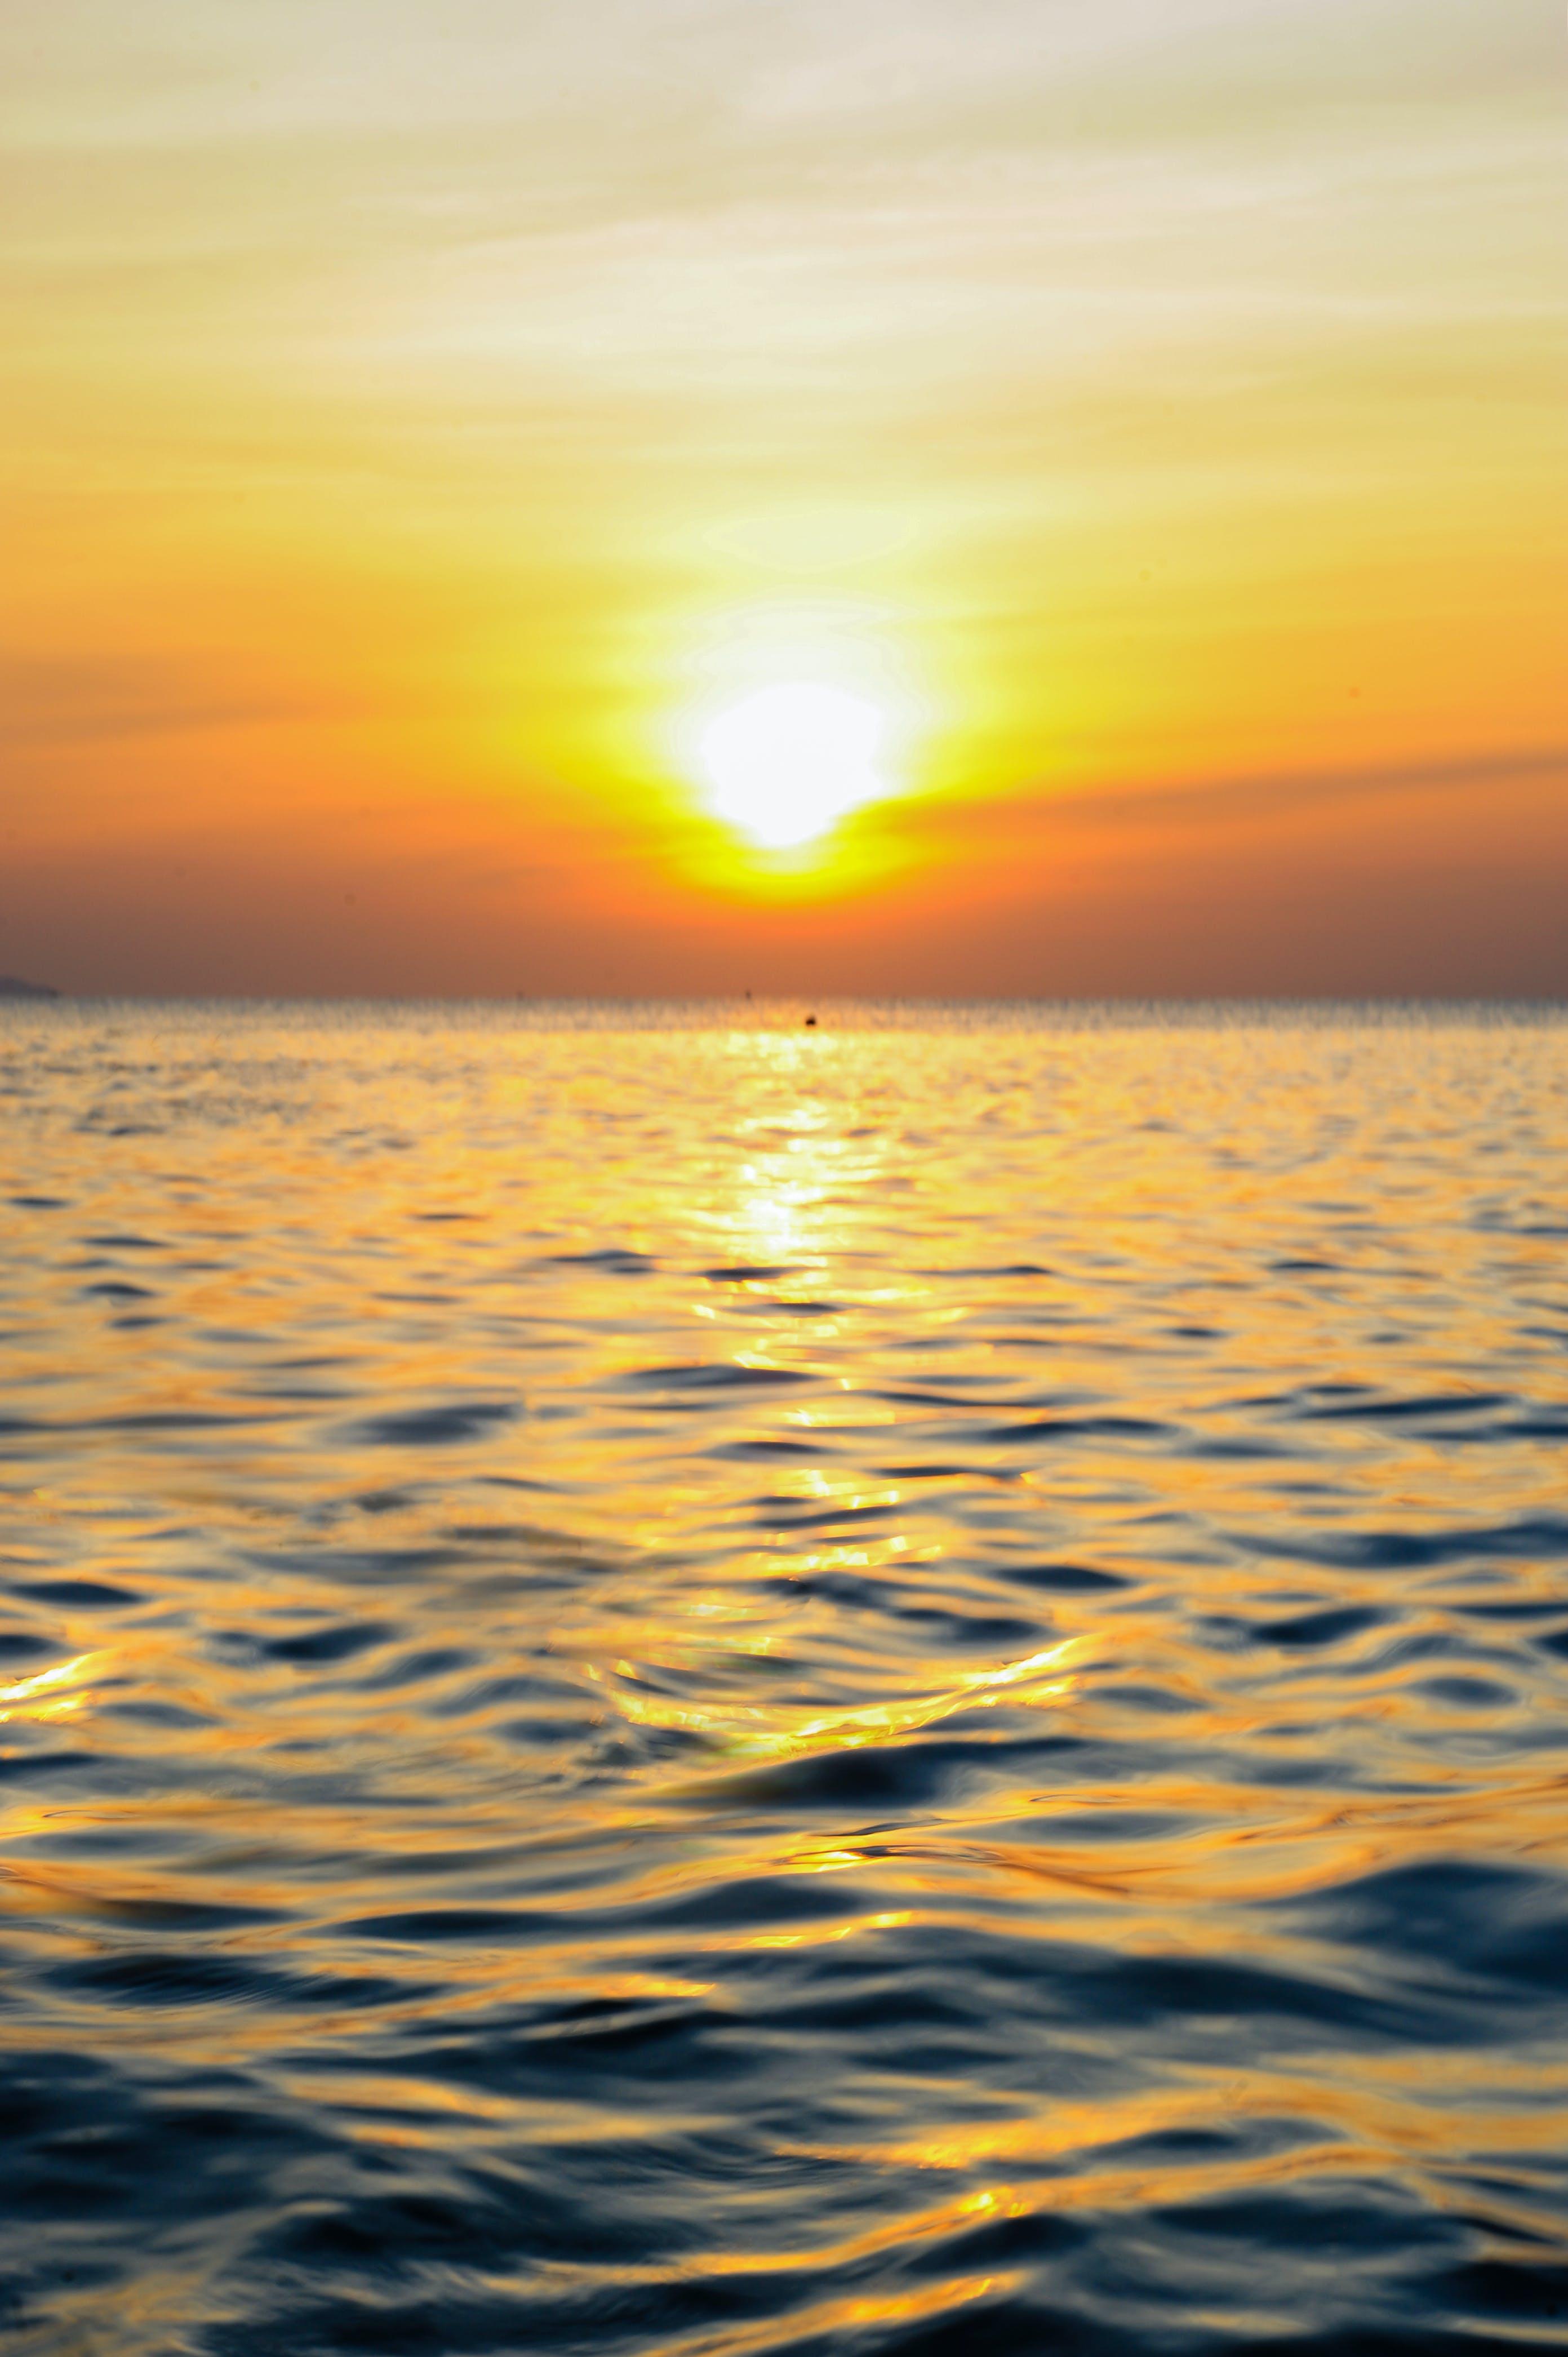 Sea Under Golden Hour